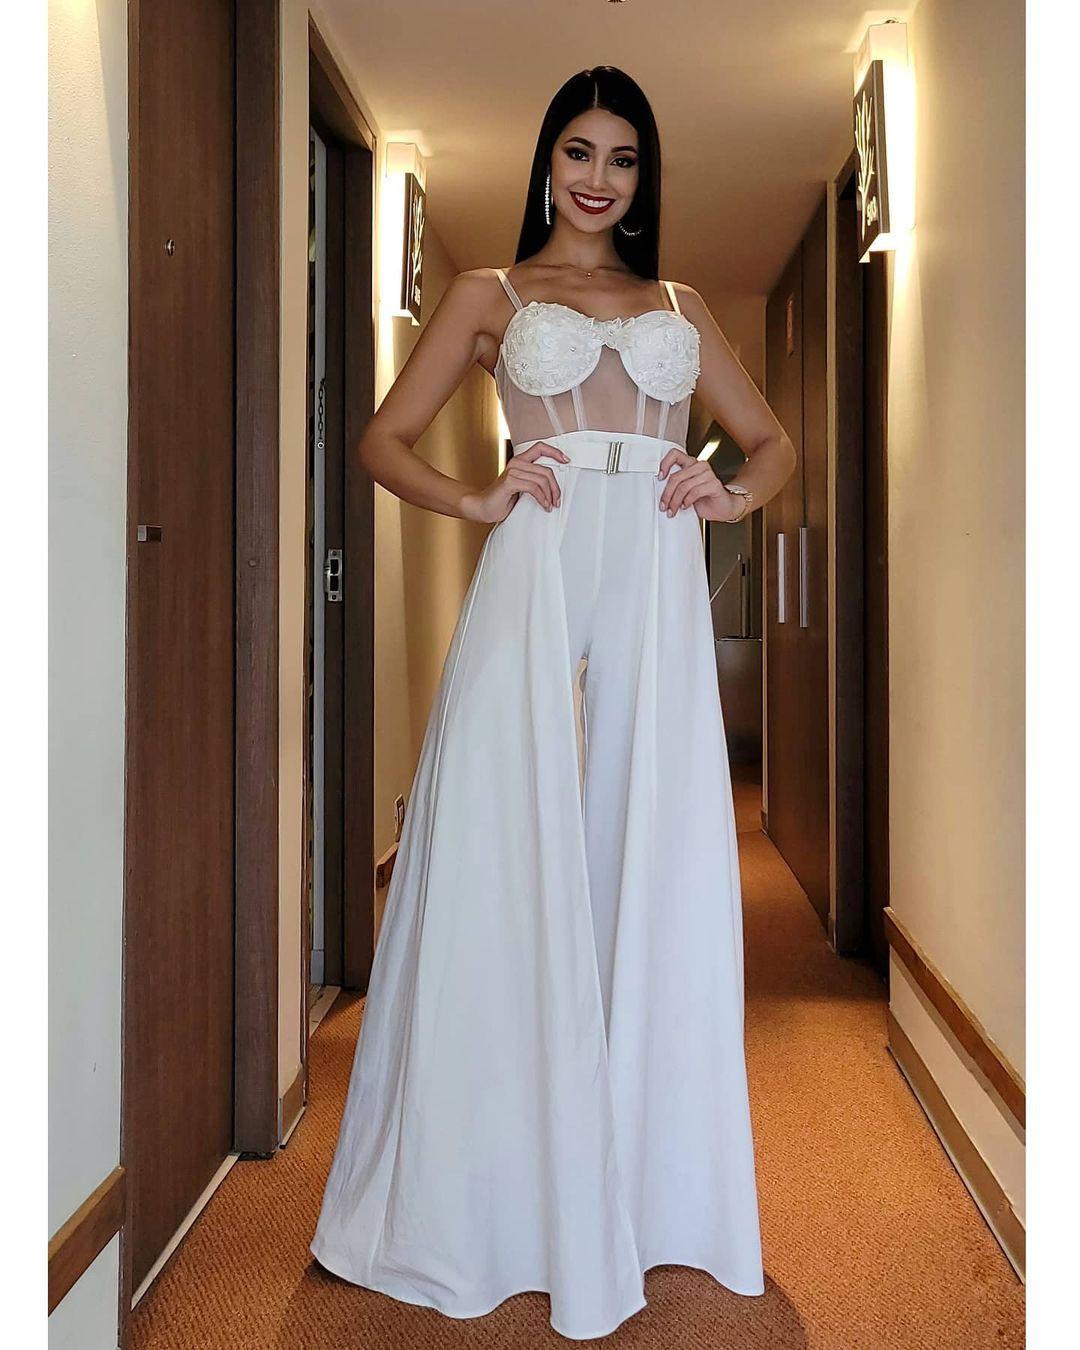 andrea aguilera, miss world colombia 2021. - Página 2 Btfsva10